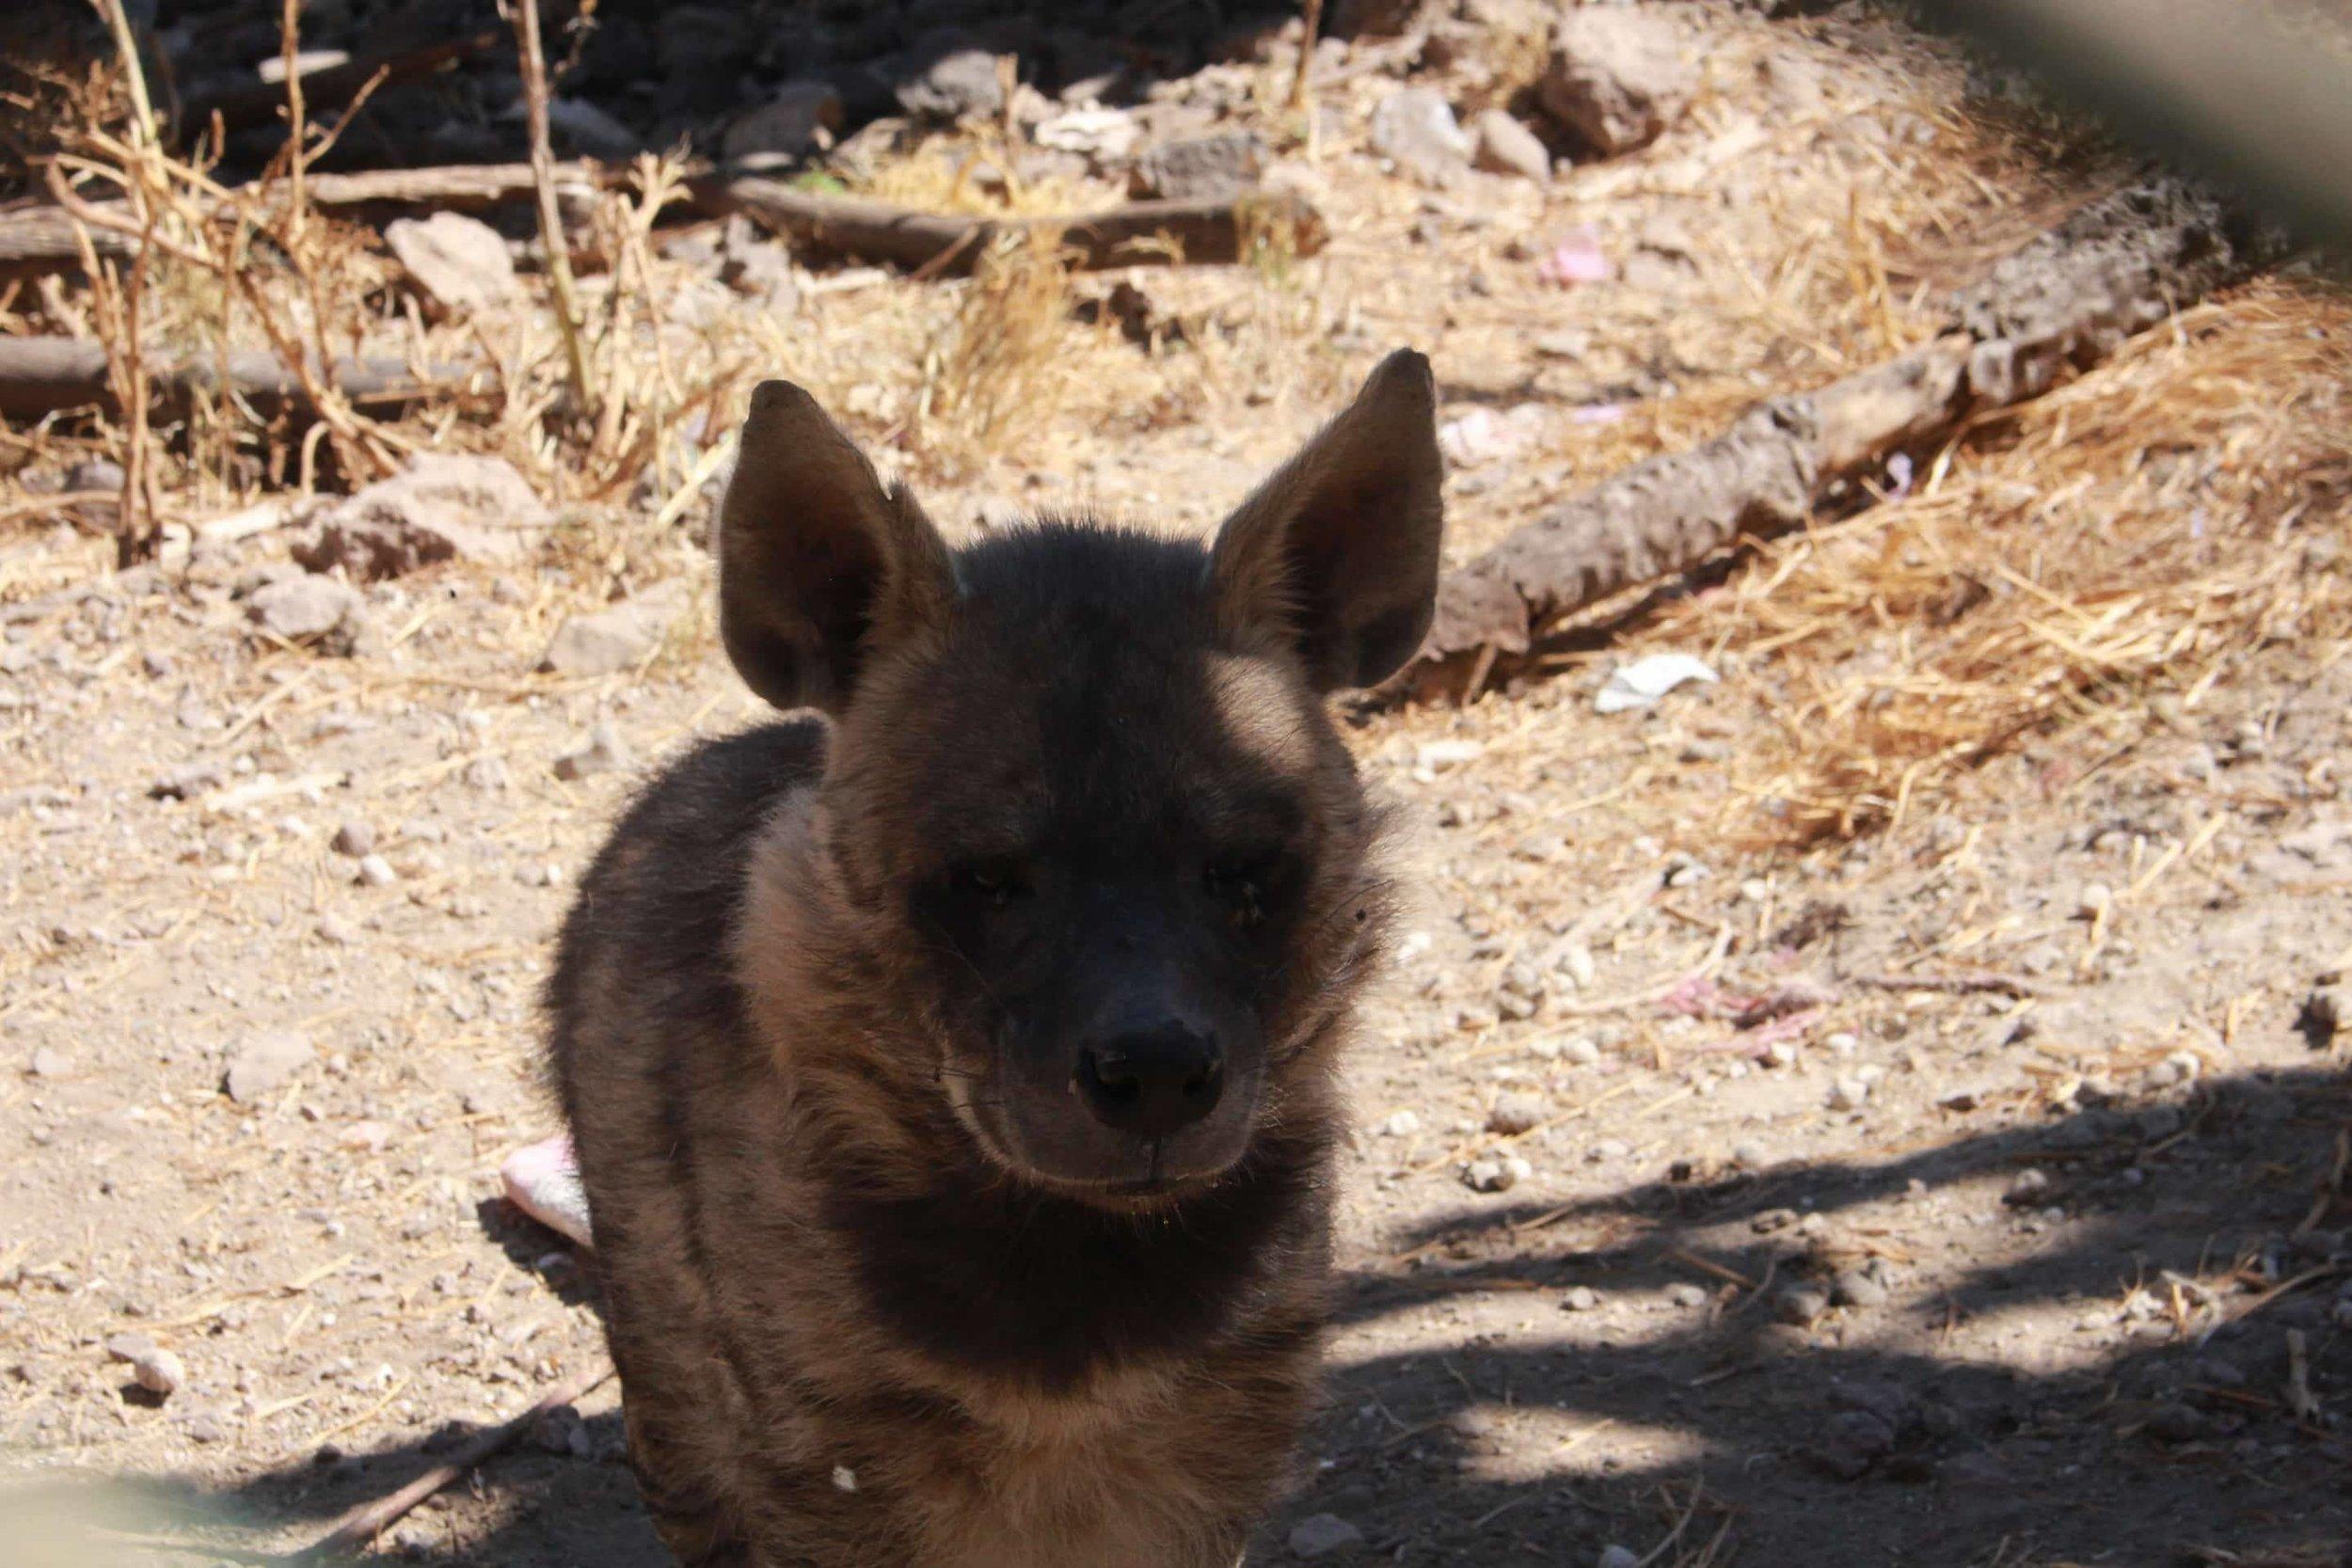 ibb zoo yemen 20 DEC 2017 the bullier striped hyena OWAP AR rescue .jpg